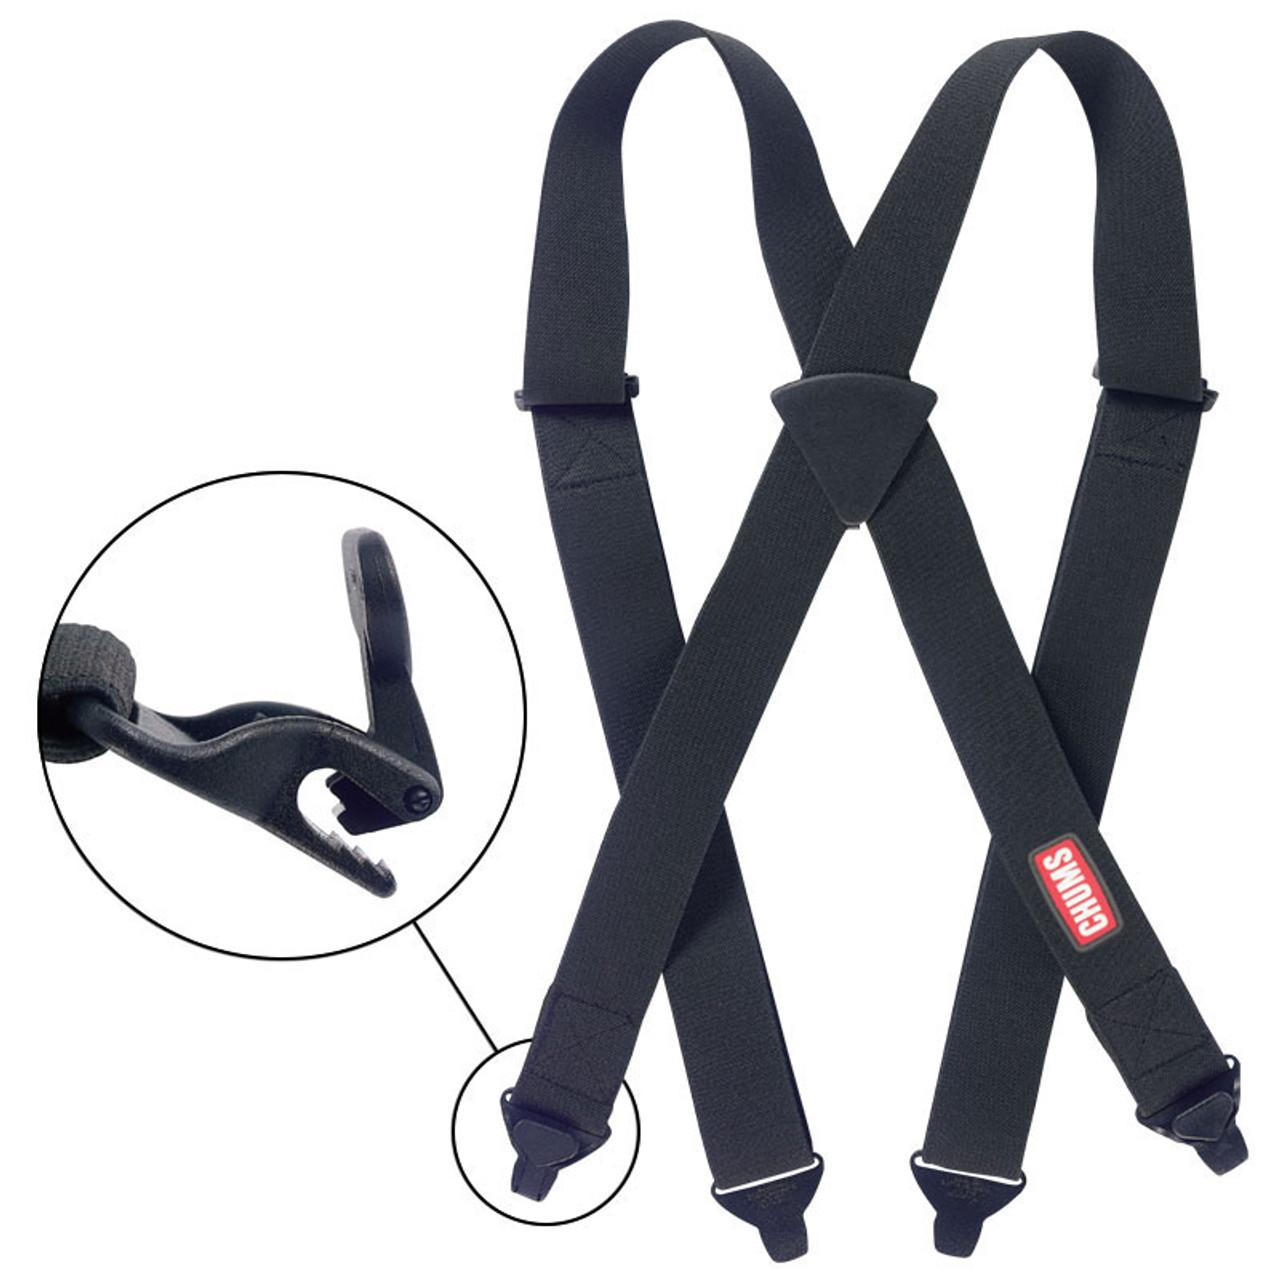 Adjustable Suspenders | Ski and Snow Pants | Chums